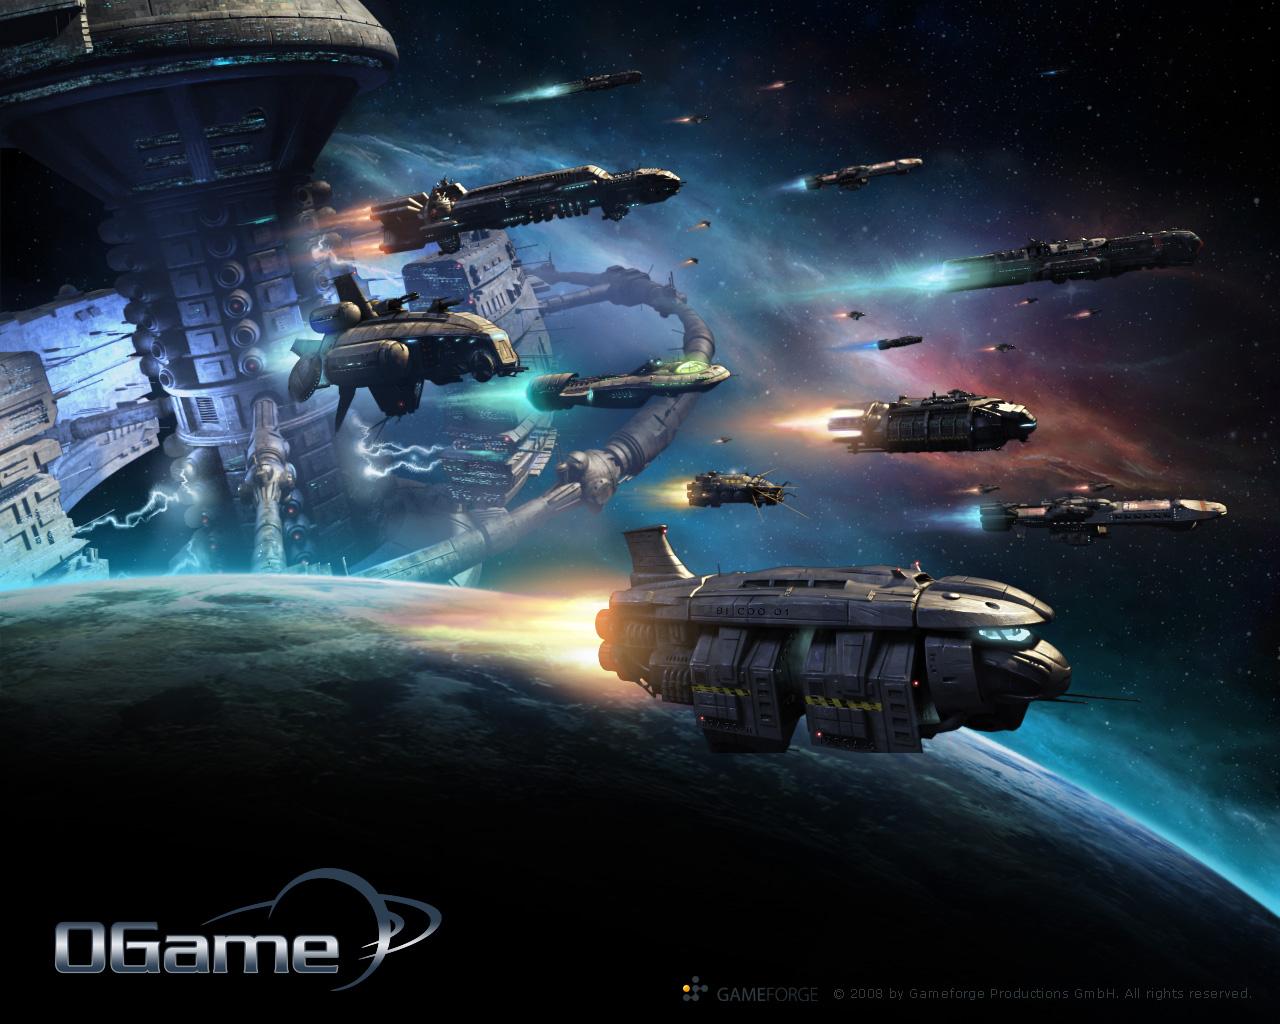 juego online como ogame: